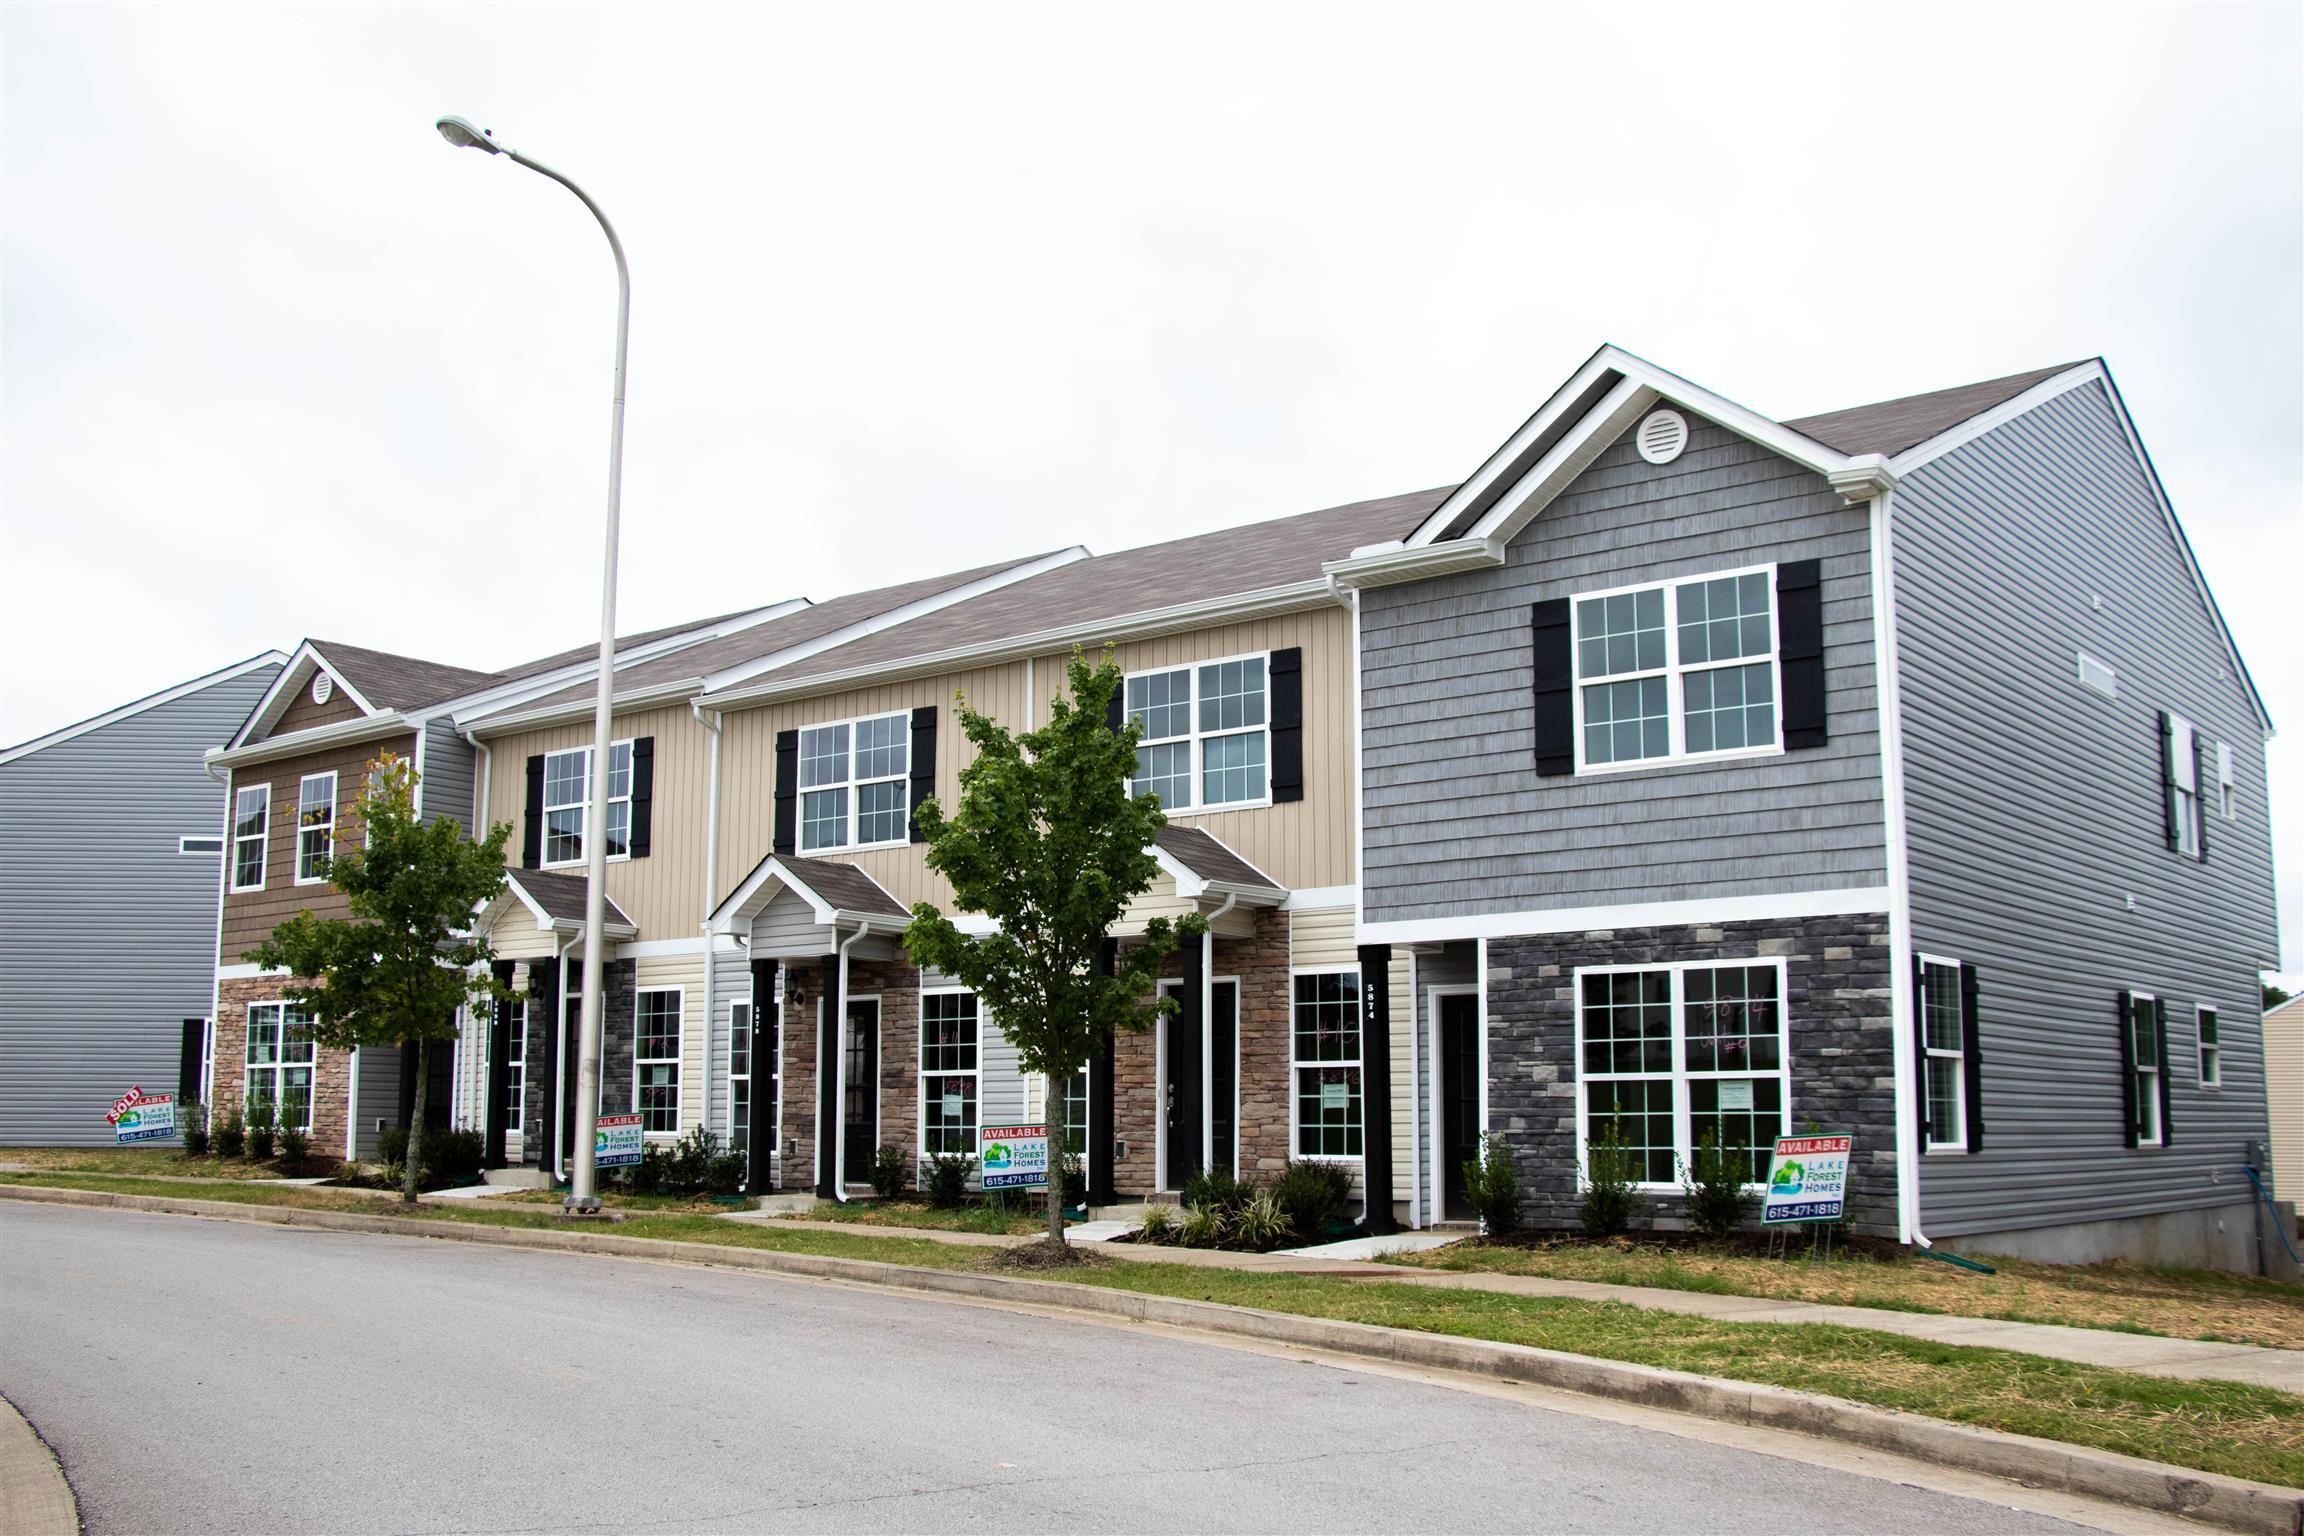 5876 Monroe Xing, Antioch, TN 37013 - Antioch, TN real estate listing